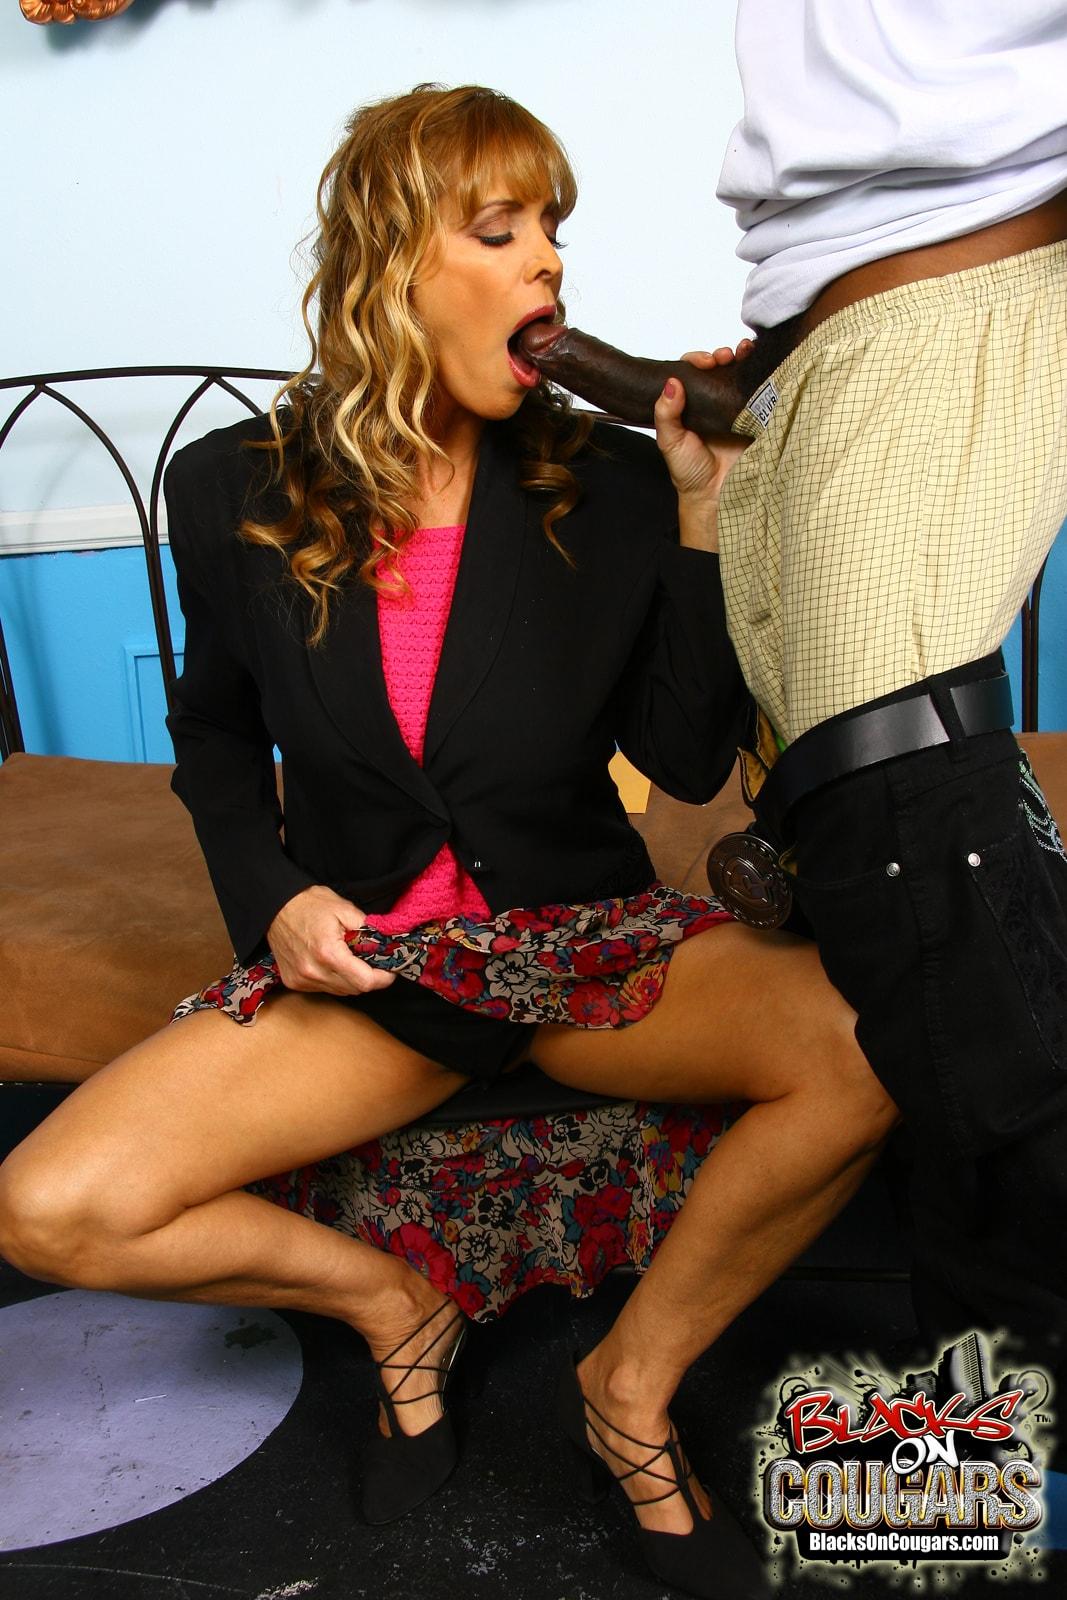 Dogfart '- Blacks On Cougars' starring Nicole Moore (Photo 11)